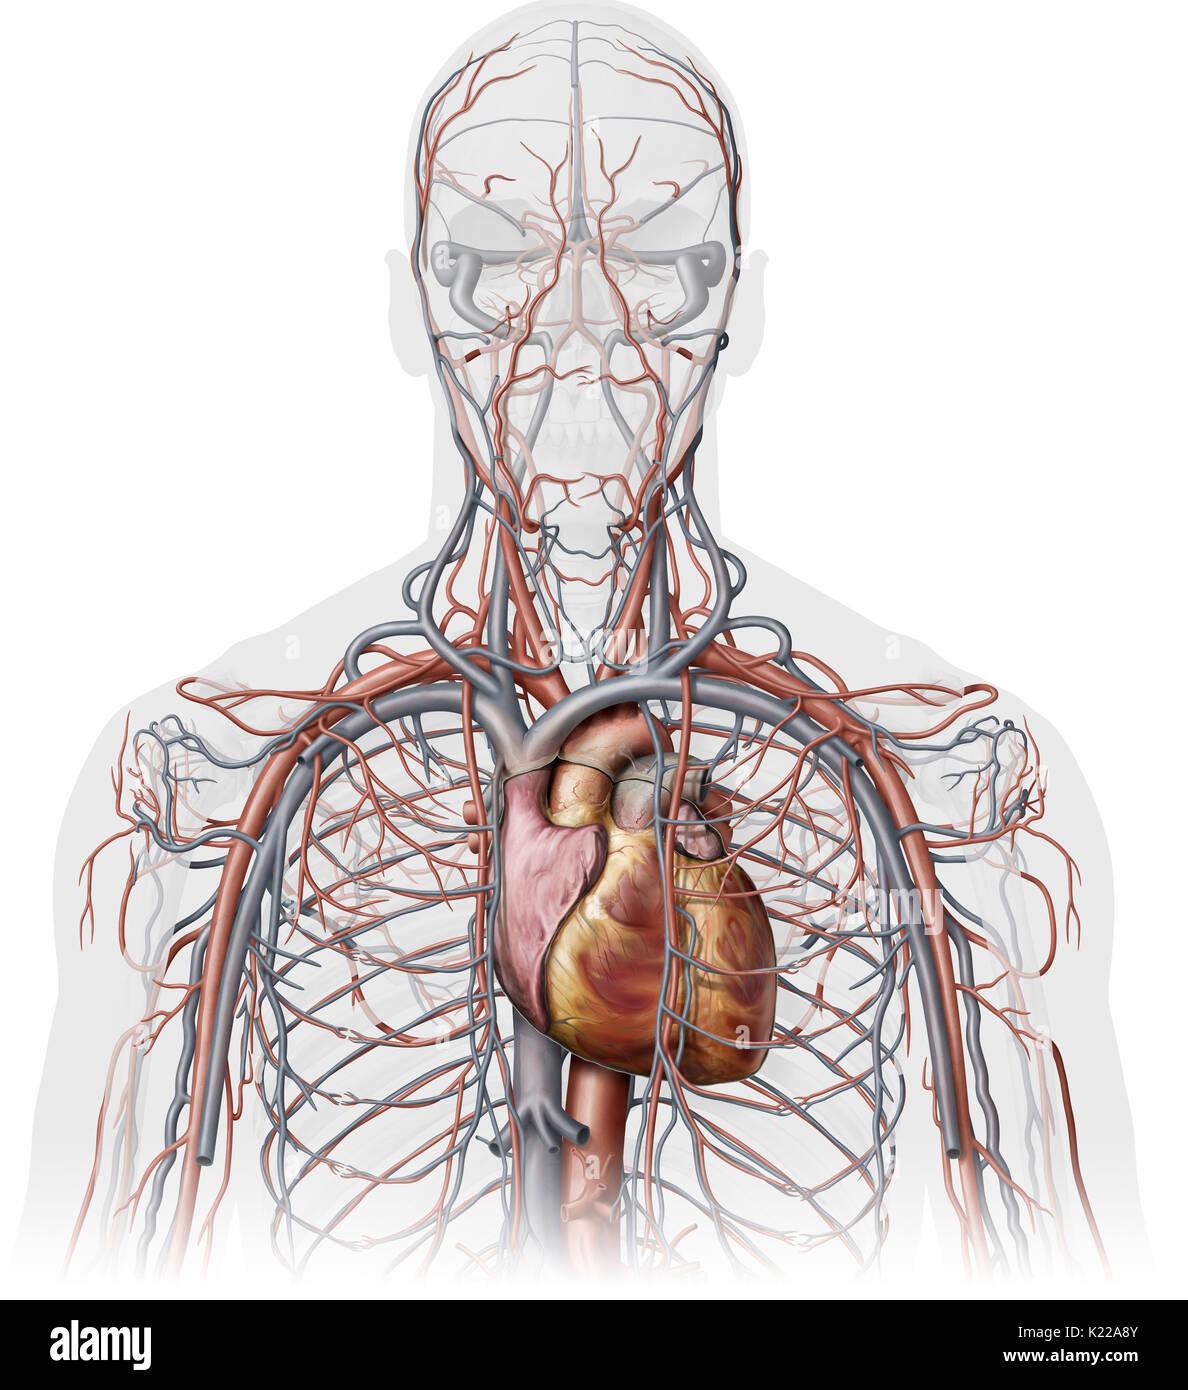 Outstanding Heart Anatomy Anterior View Sketch - Anatomy Ideas ...